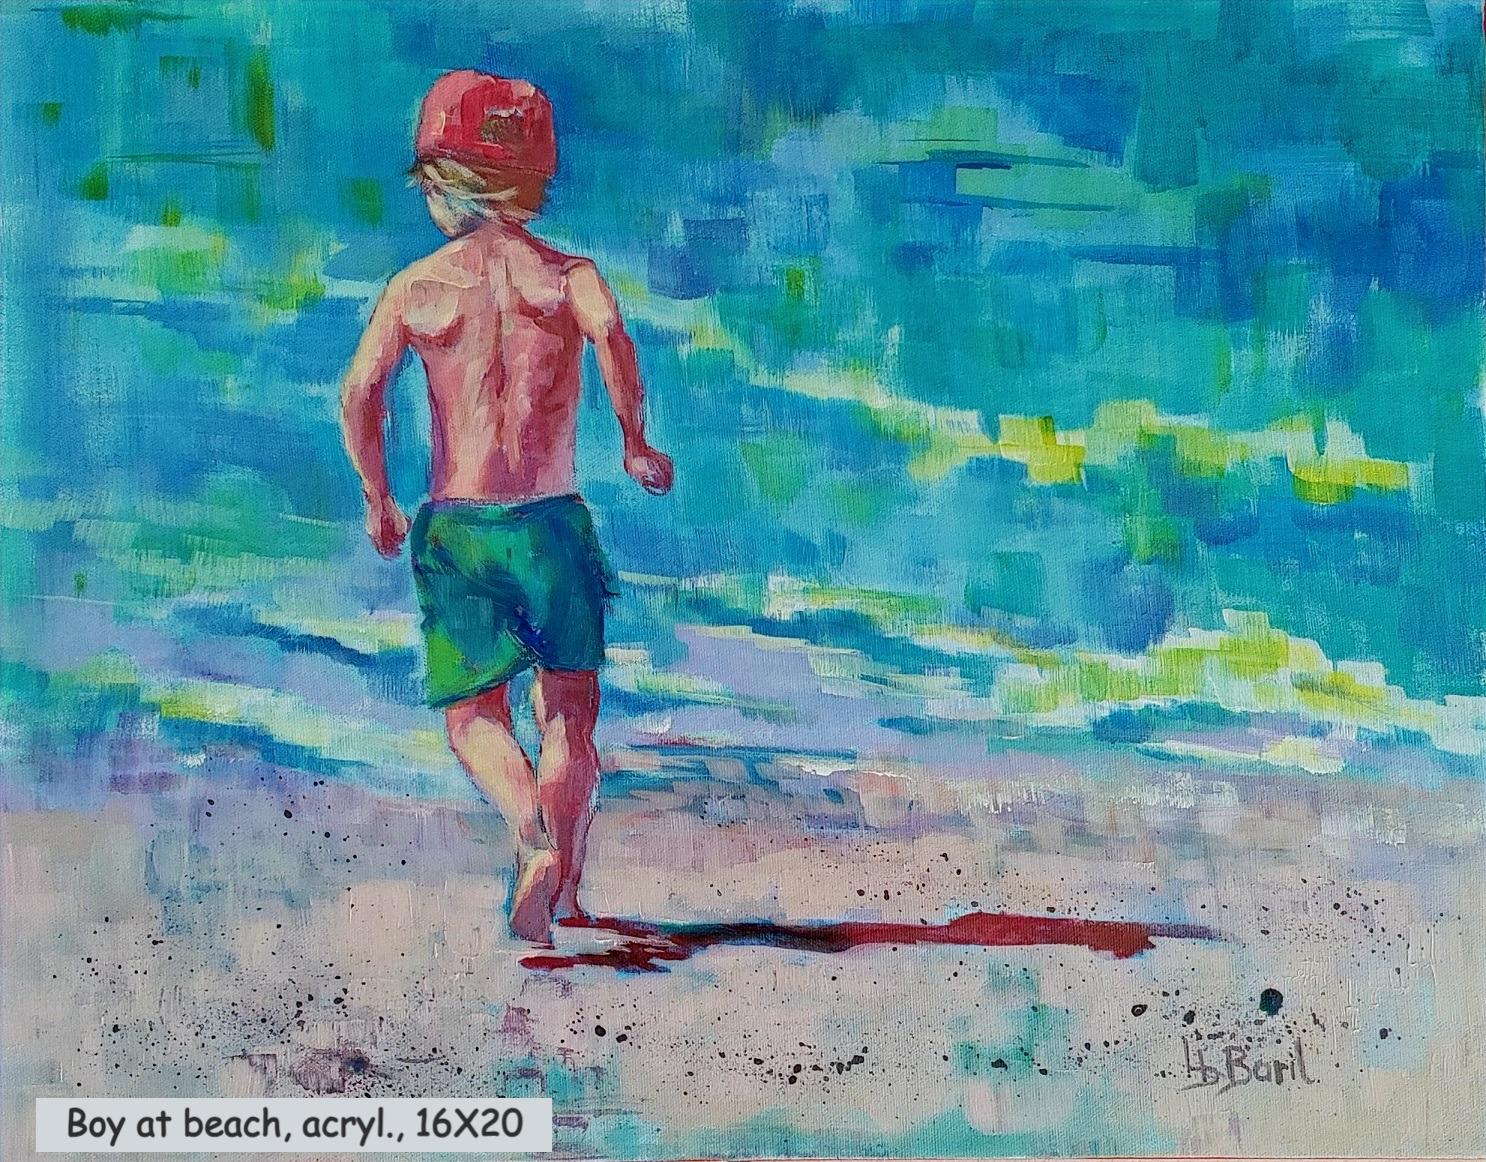 Boy at beach, acrylic, 16X20